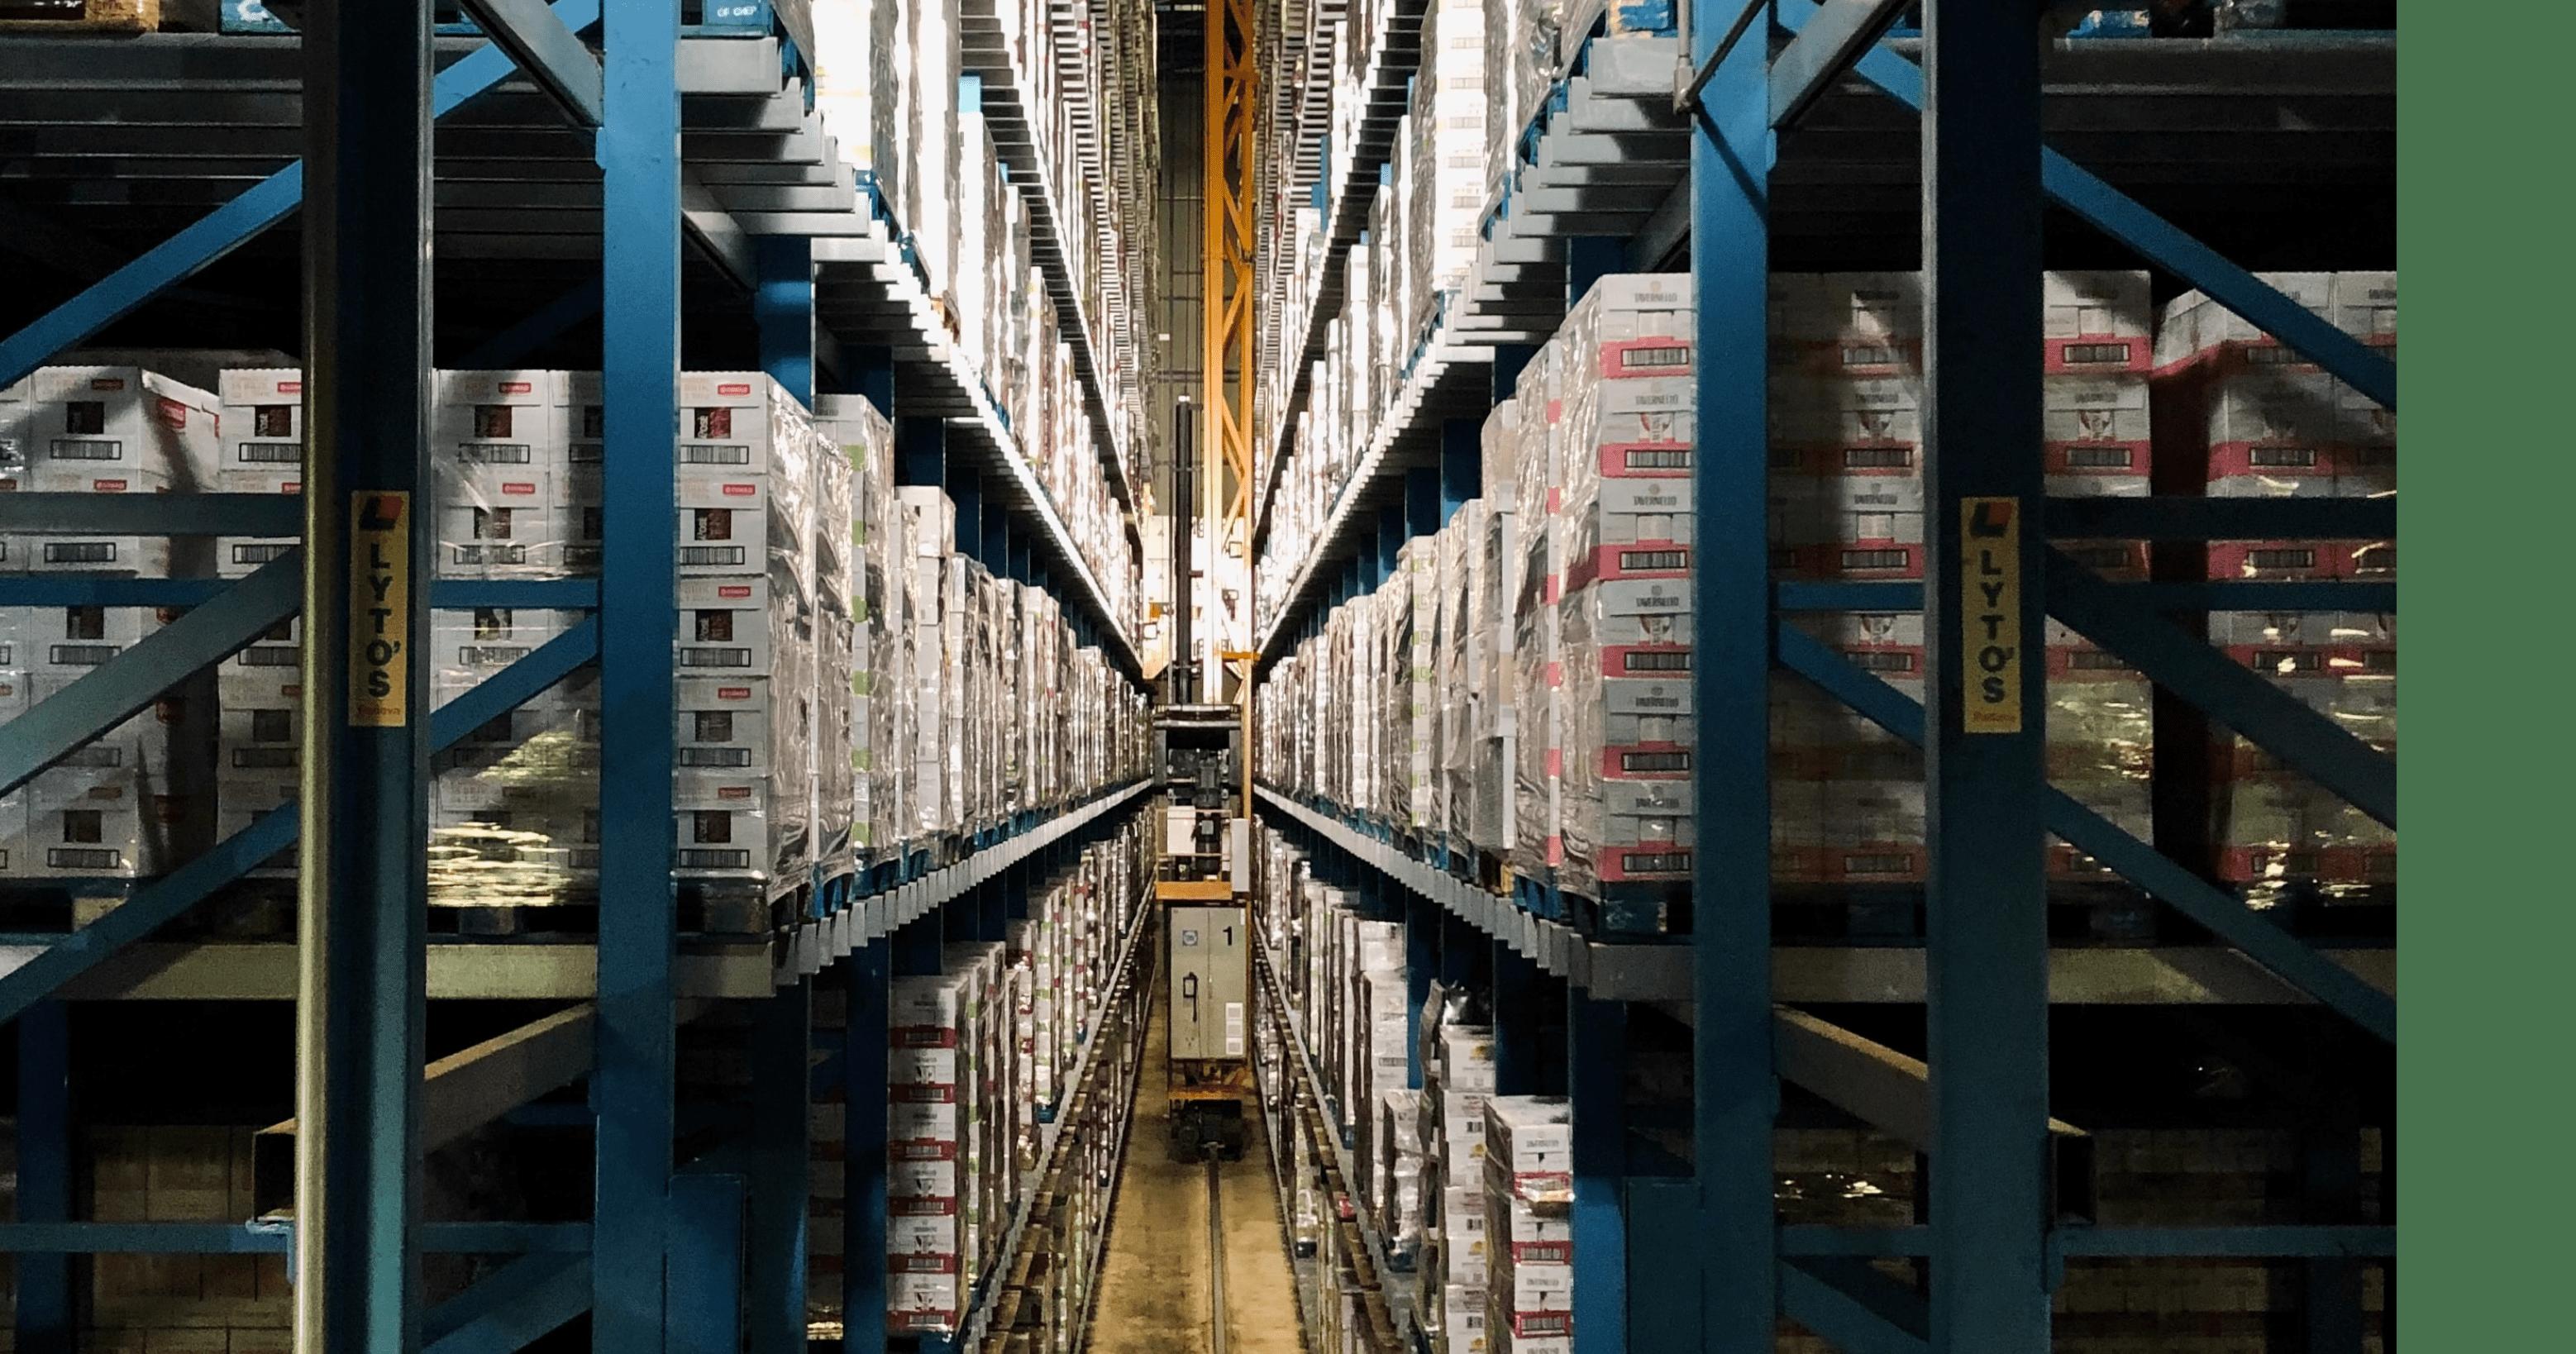 imagen de un almacén